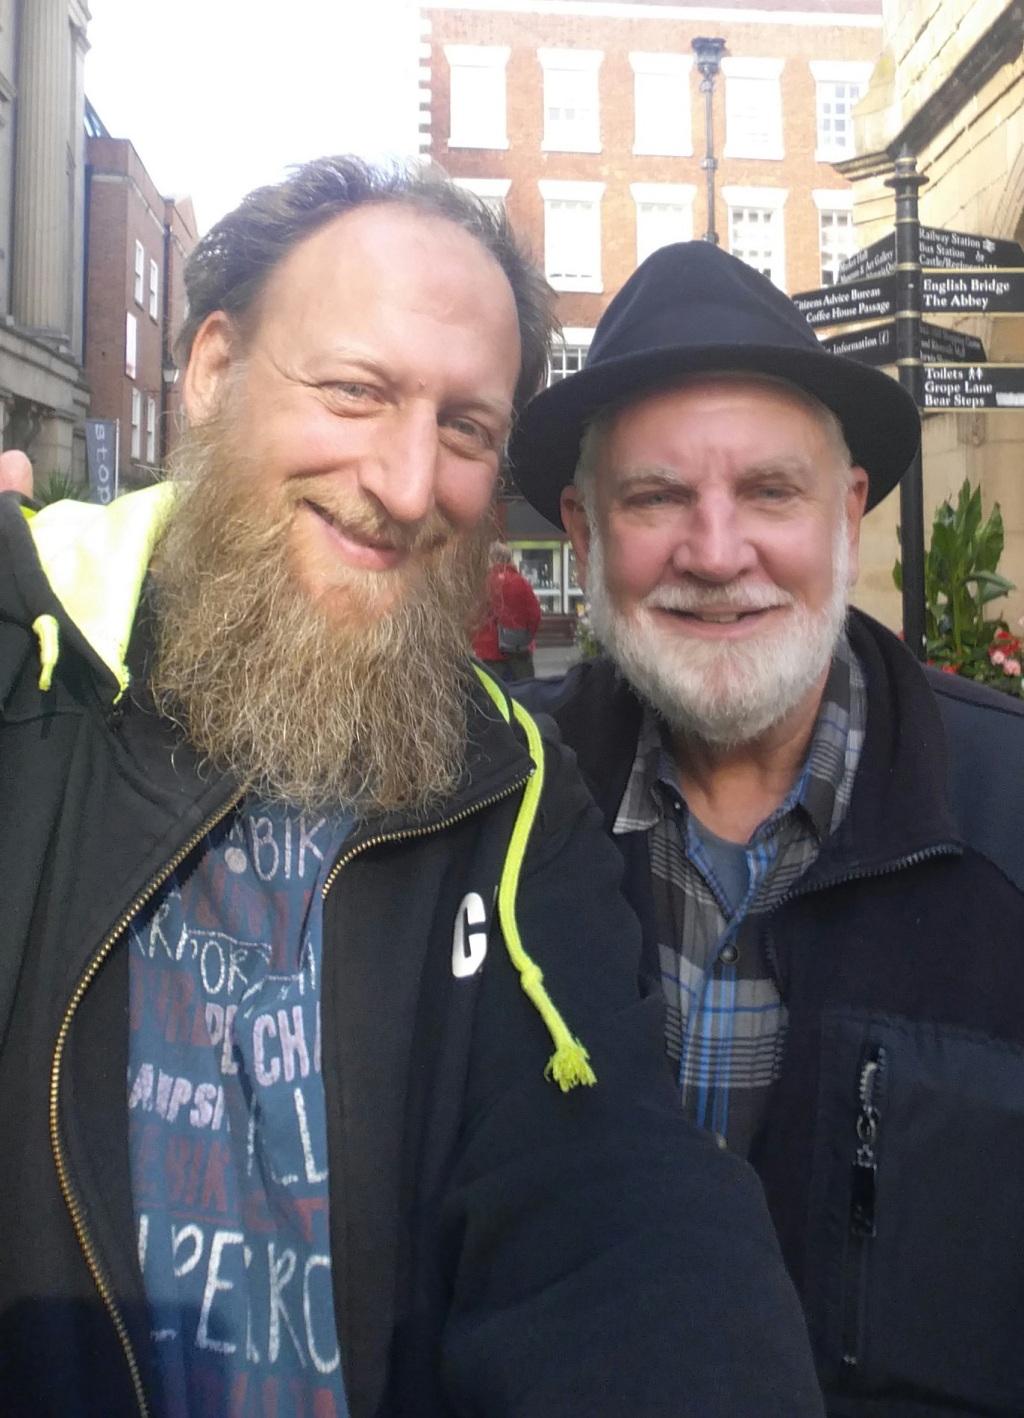 Sam met with Abdurraheem Green, an English